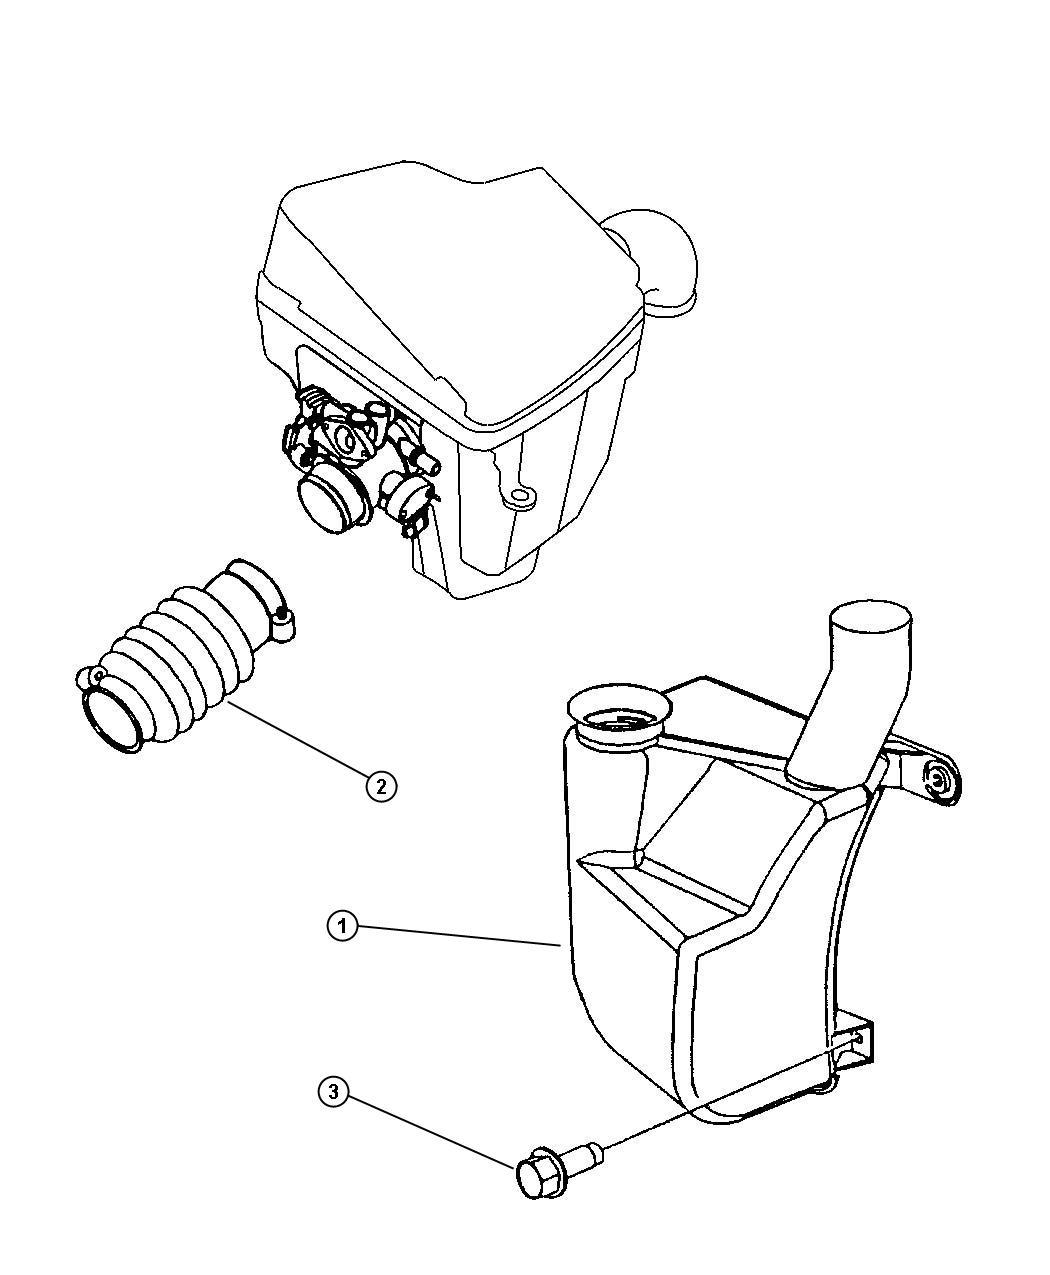 Dodge Neon Resonator Fresh Air Without Srt Design